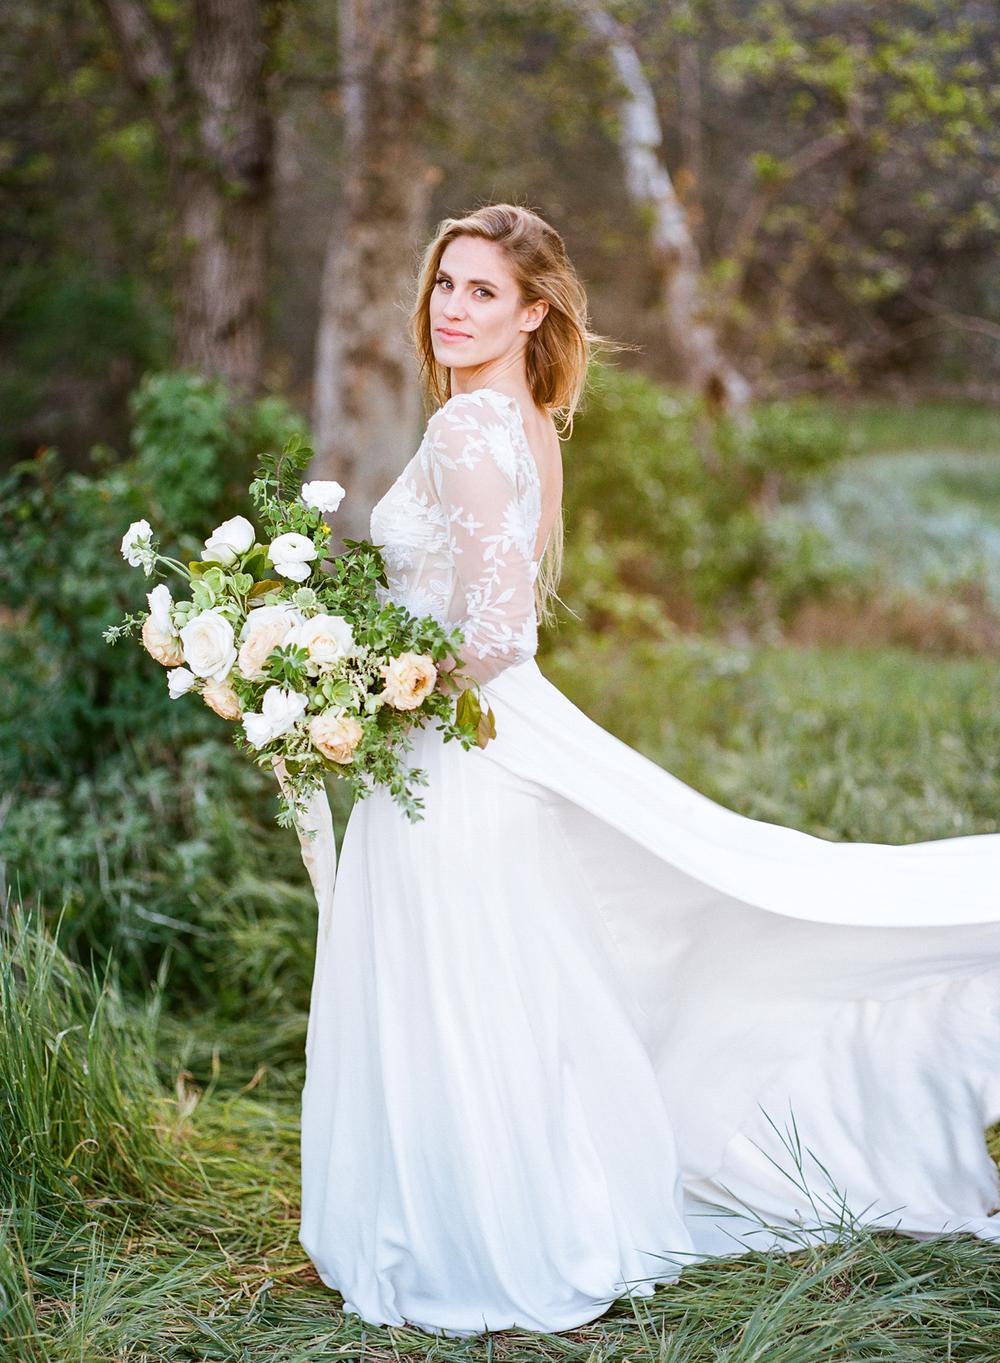 011-Jen-Wojcik-Photography-San-Diego-Photographer.jpg